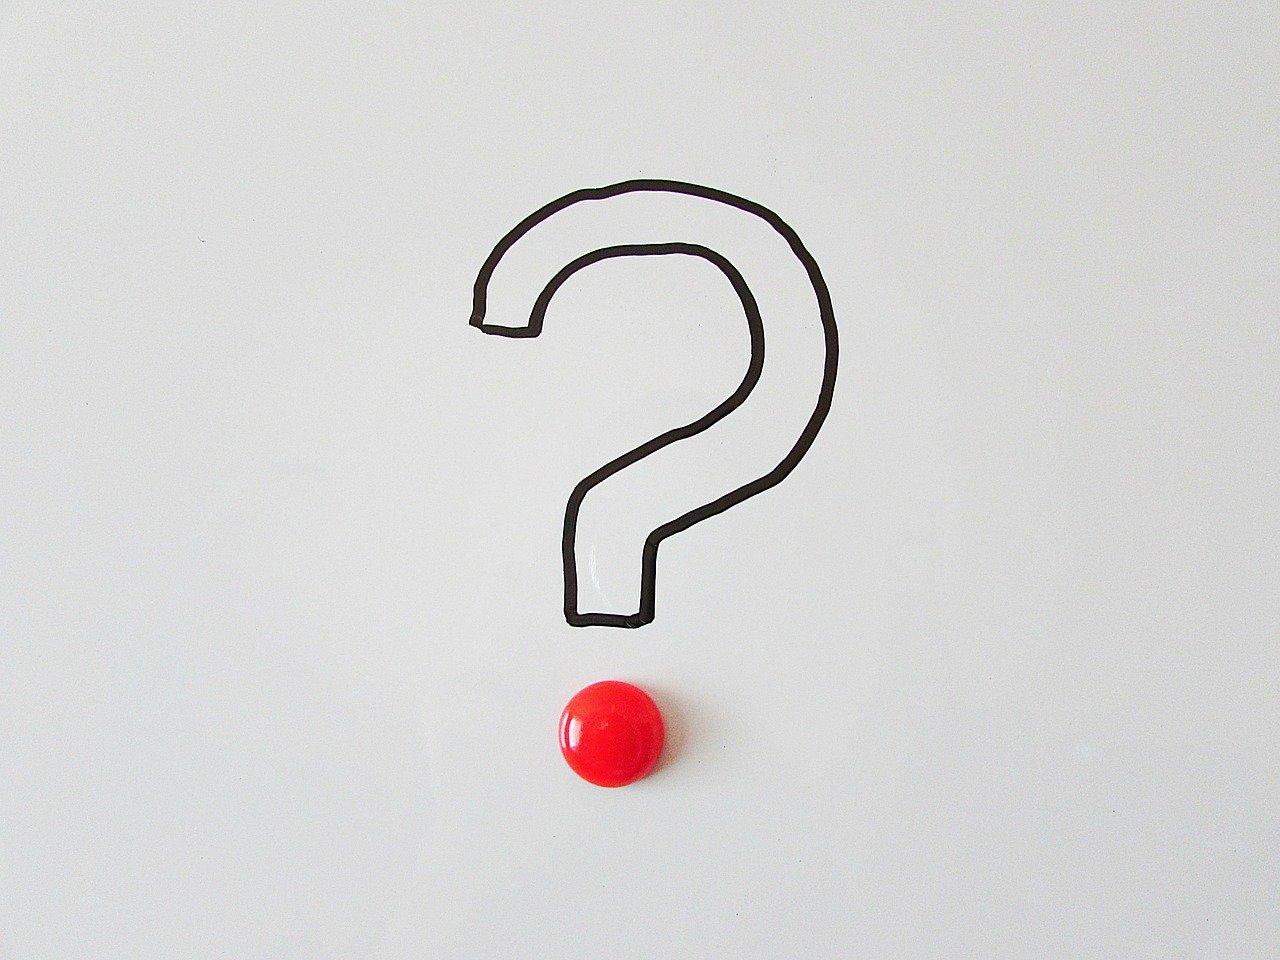 question mark, question, symbol